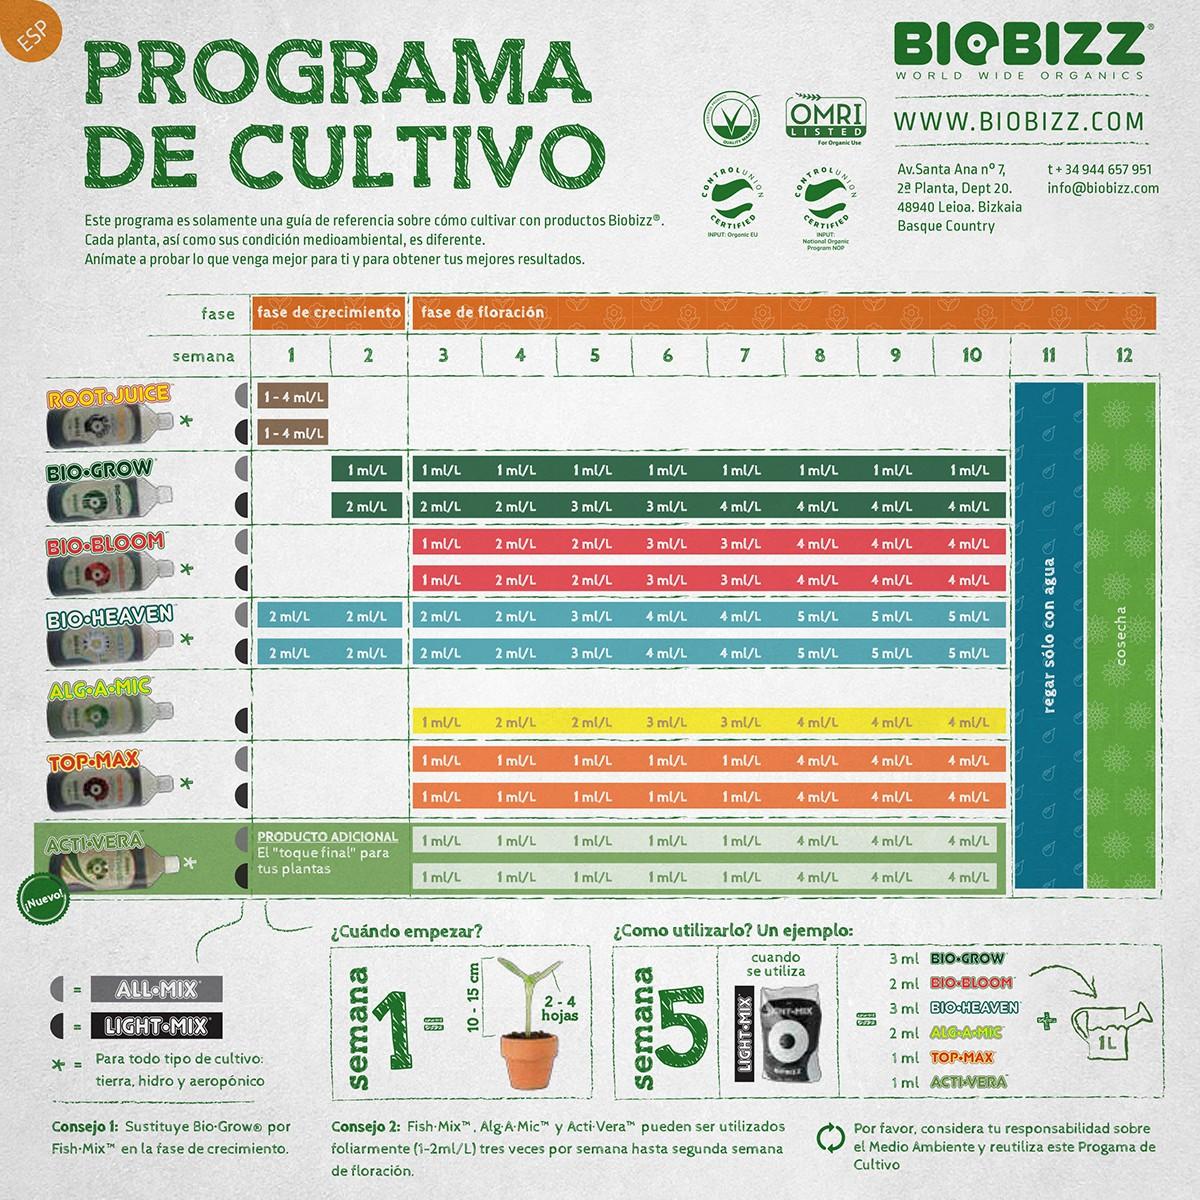 Tabla de cultivo Biobizz